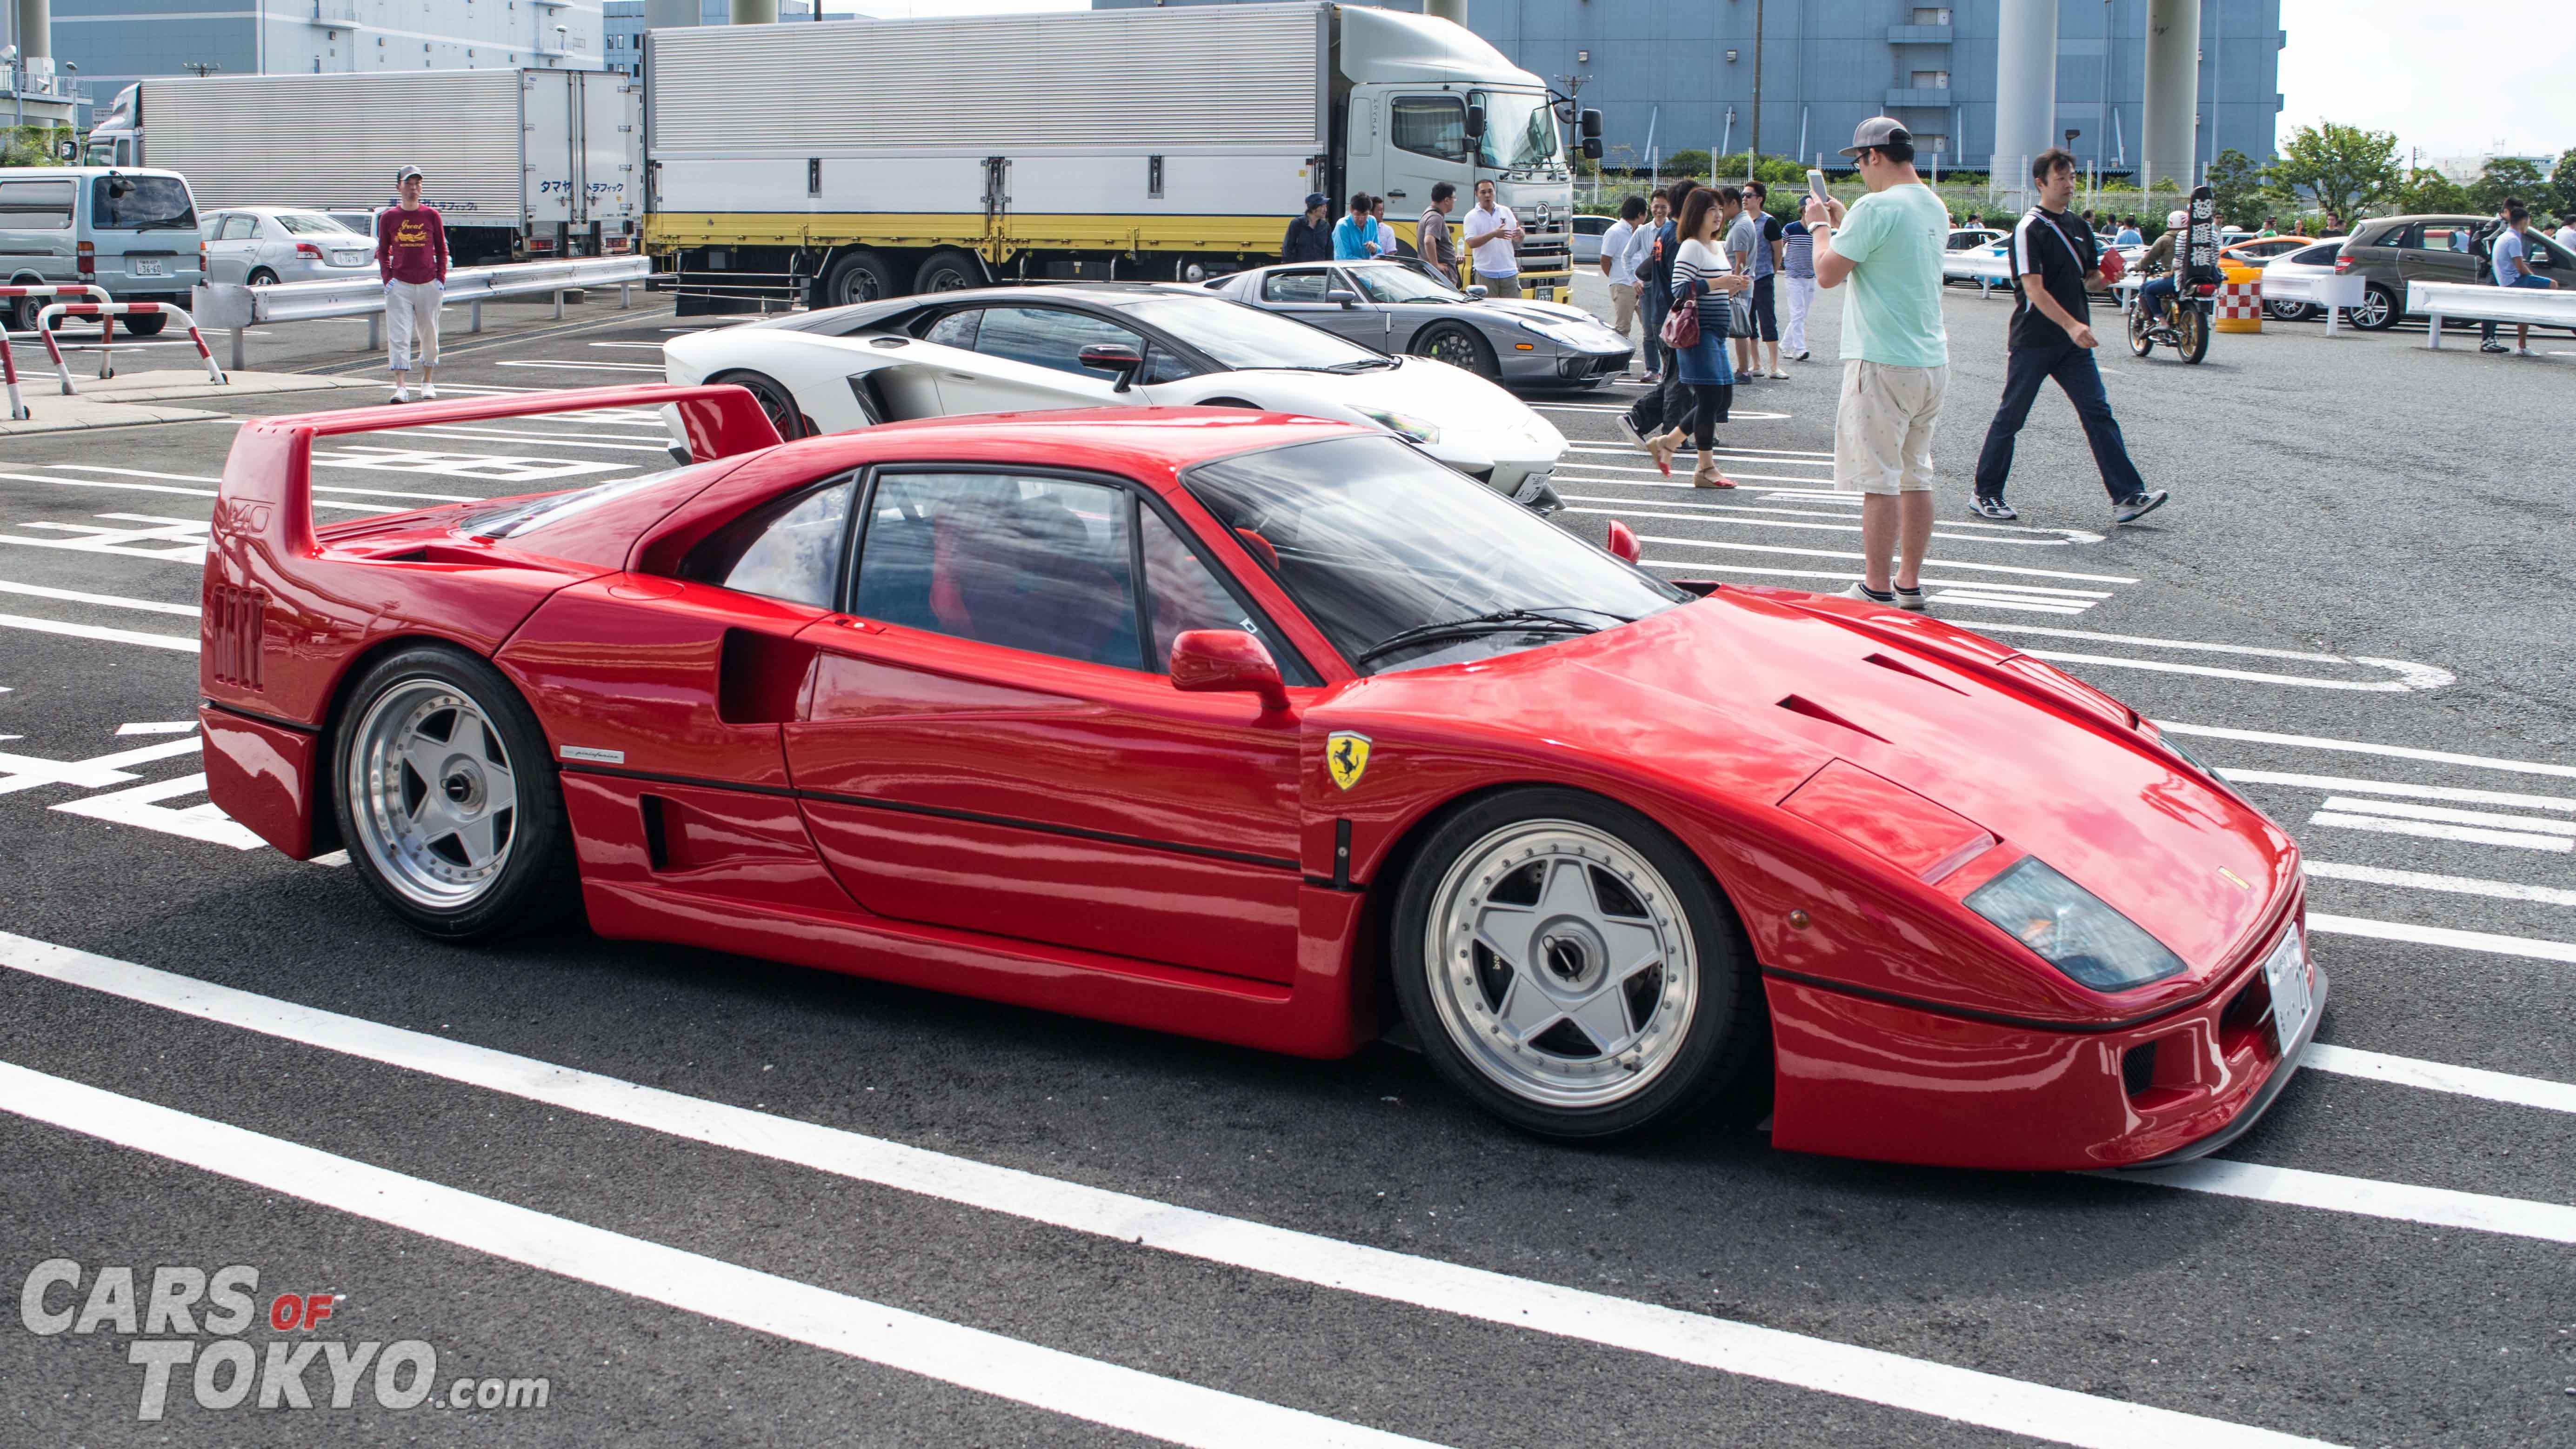 cars-of-tokyo-daikoku-ferrari-f40